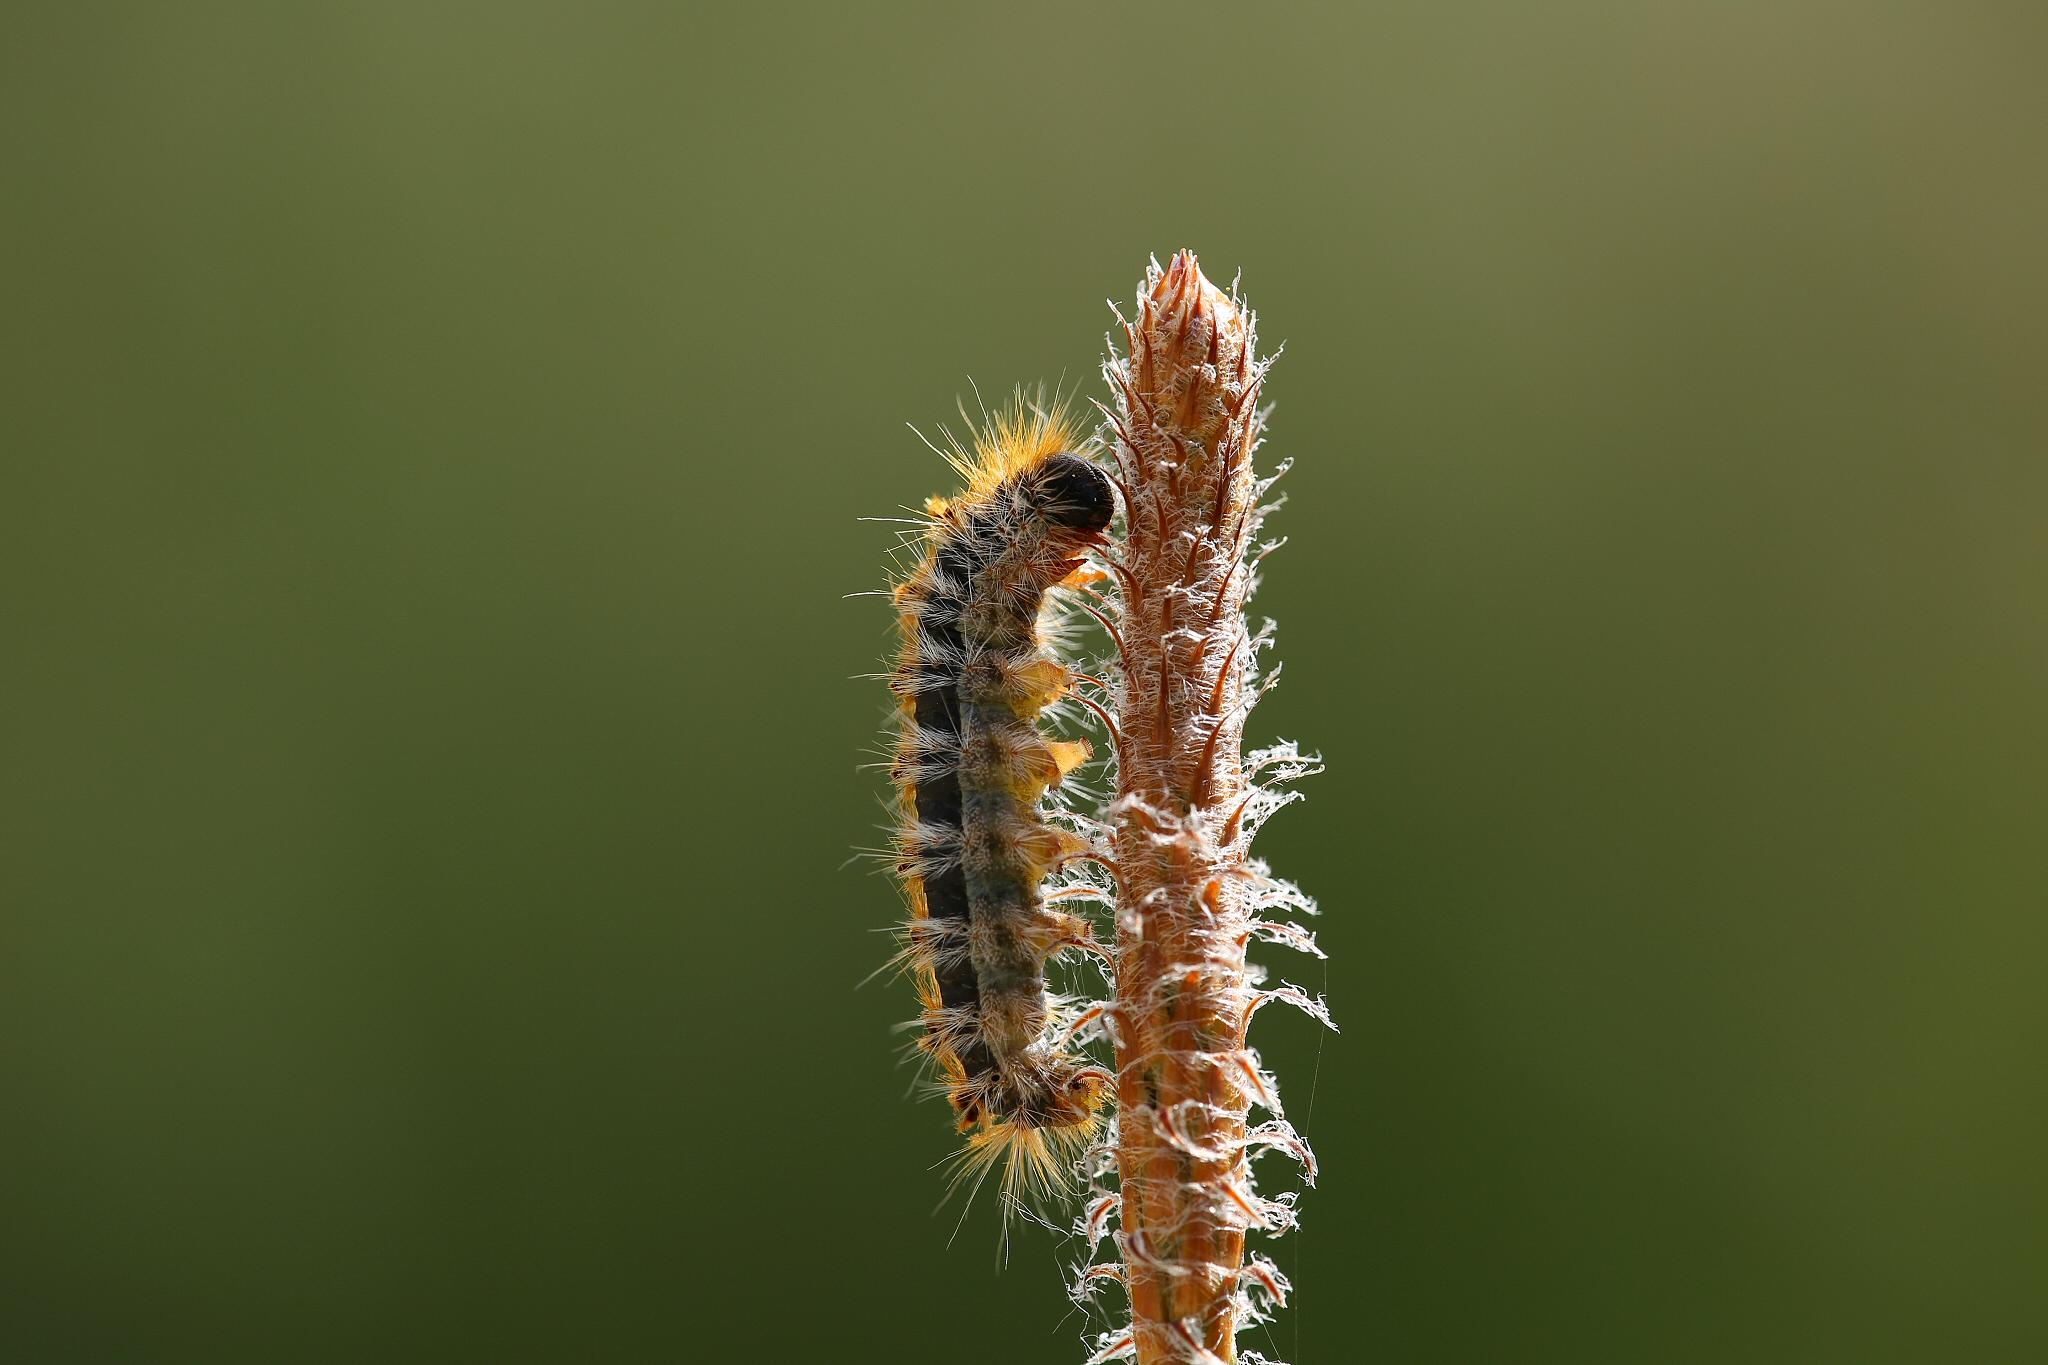 Thaumetopea pityocampa by bulentboz